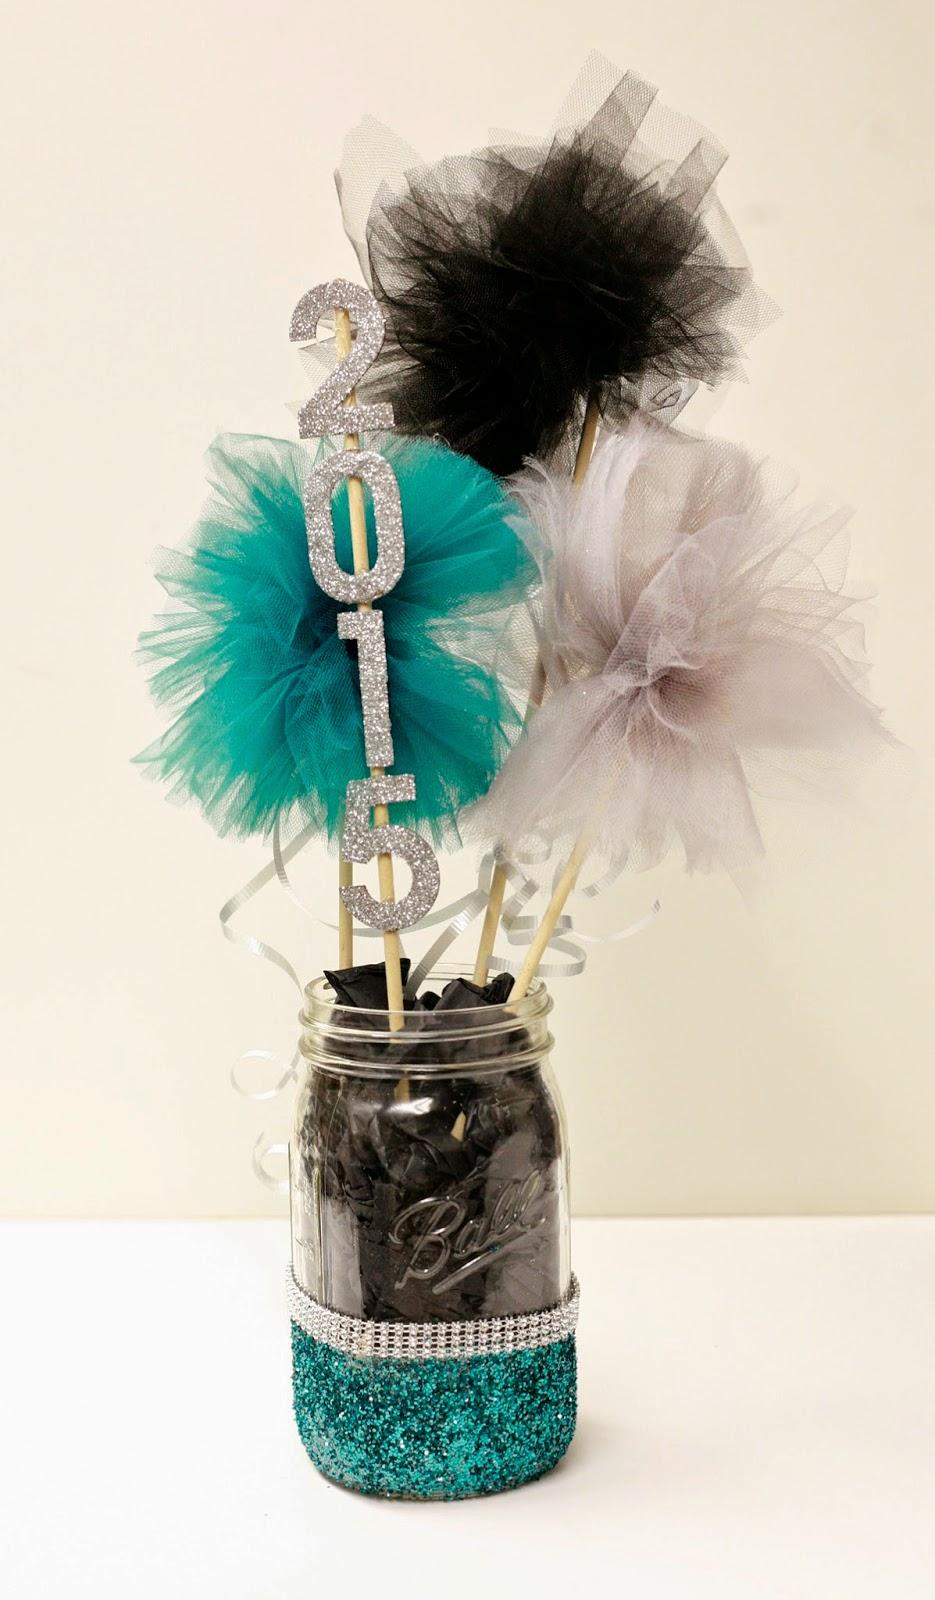 Ben Franklin Crafts and Frame Shop: DIY Graduation Party Decor